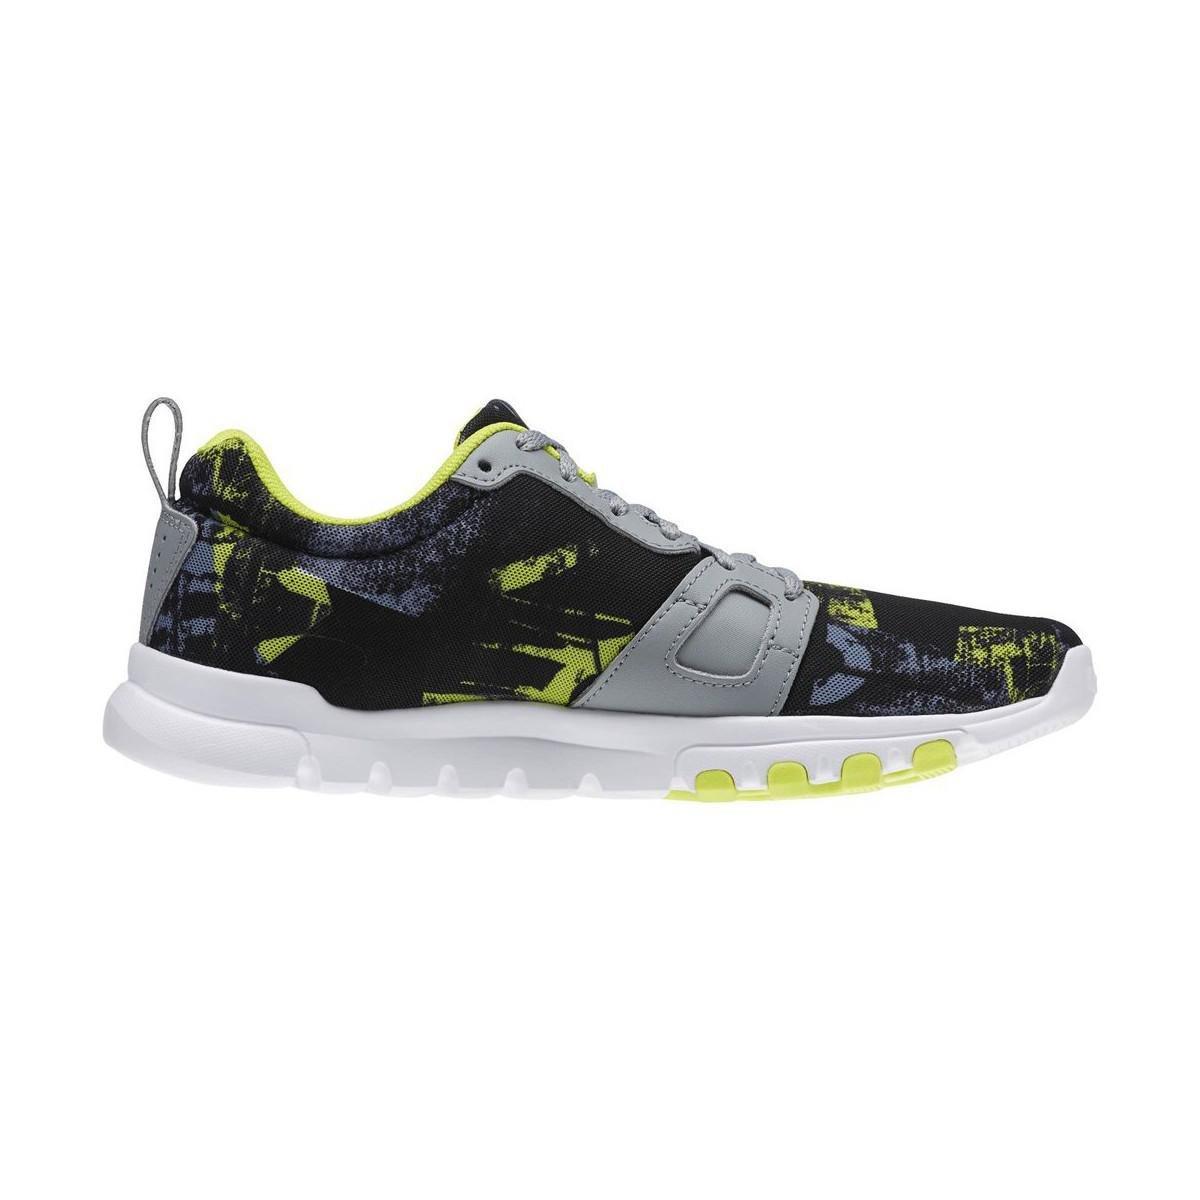 Reebok Sublite Train Women's Shoes (trainers) In Green